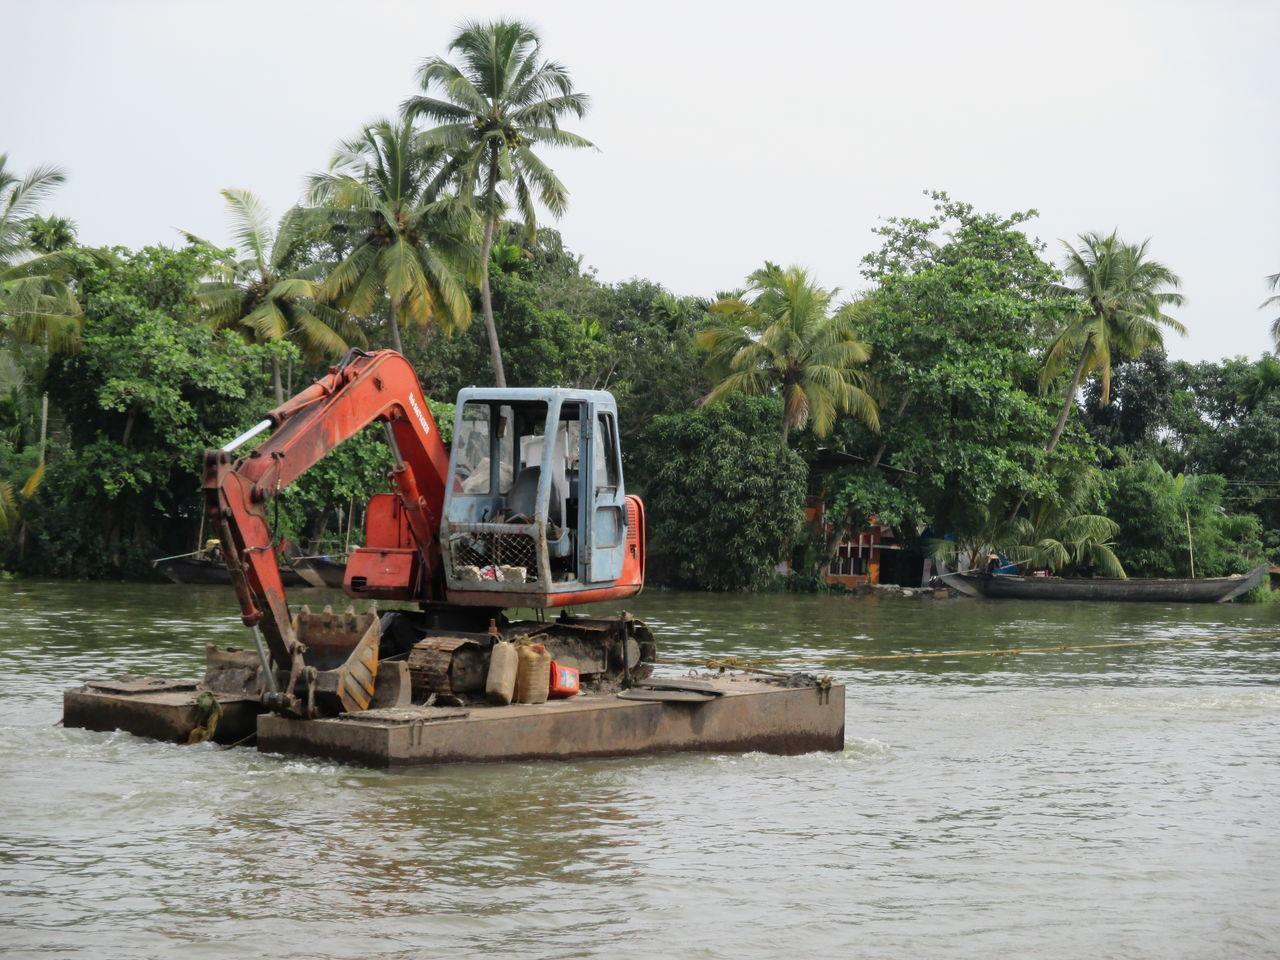 India Backwaters India Transport Mode Of Transport India Kerala India Fuji Work River Water EyeEm Best Shots Eyembestpics